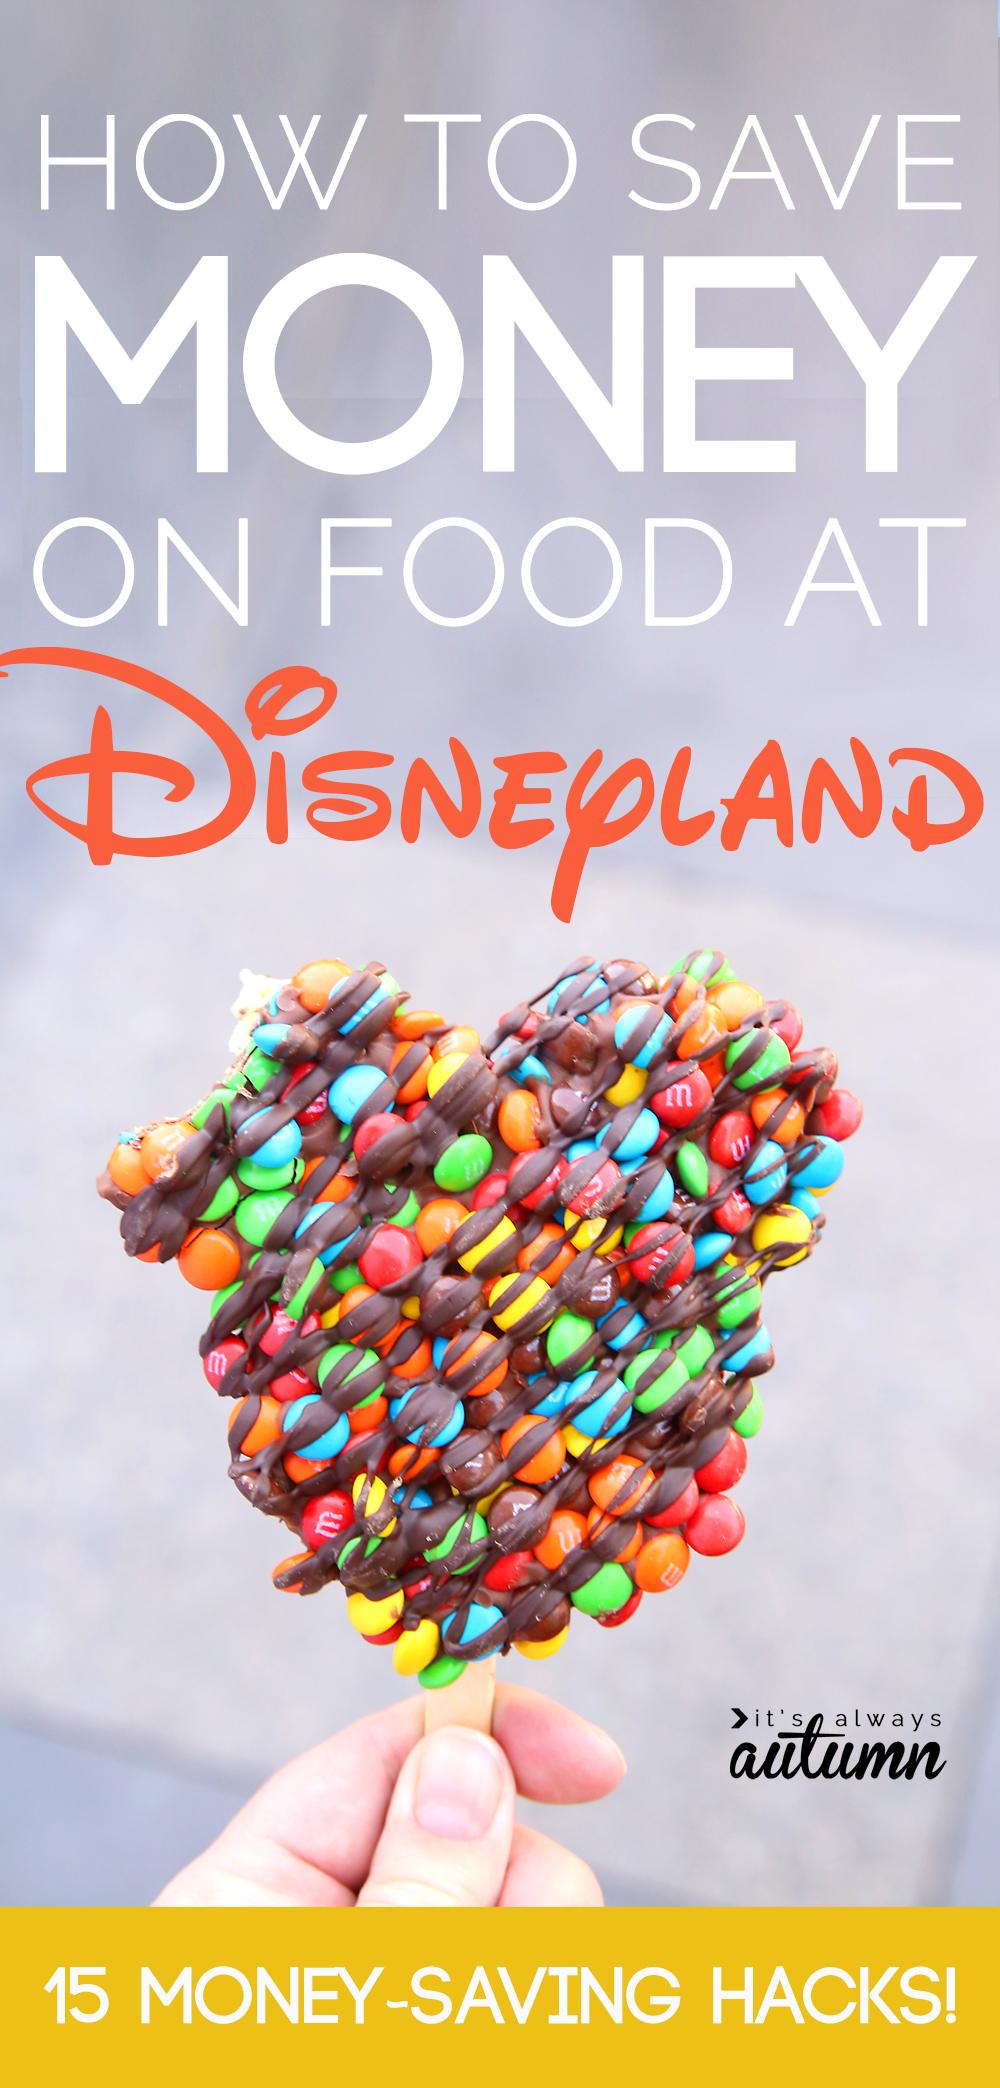 best hacks for saving money on food at Disneyland - It's